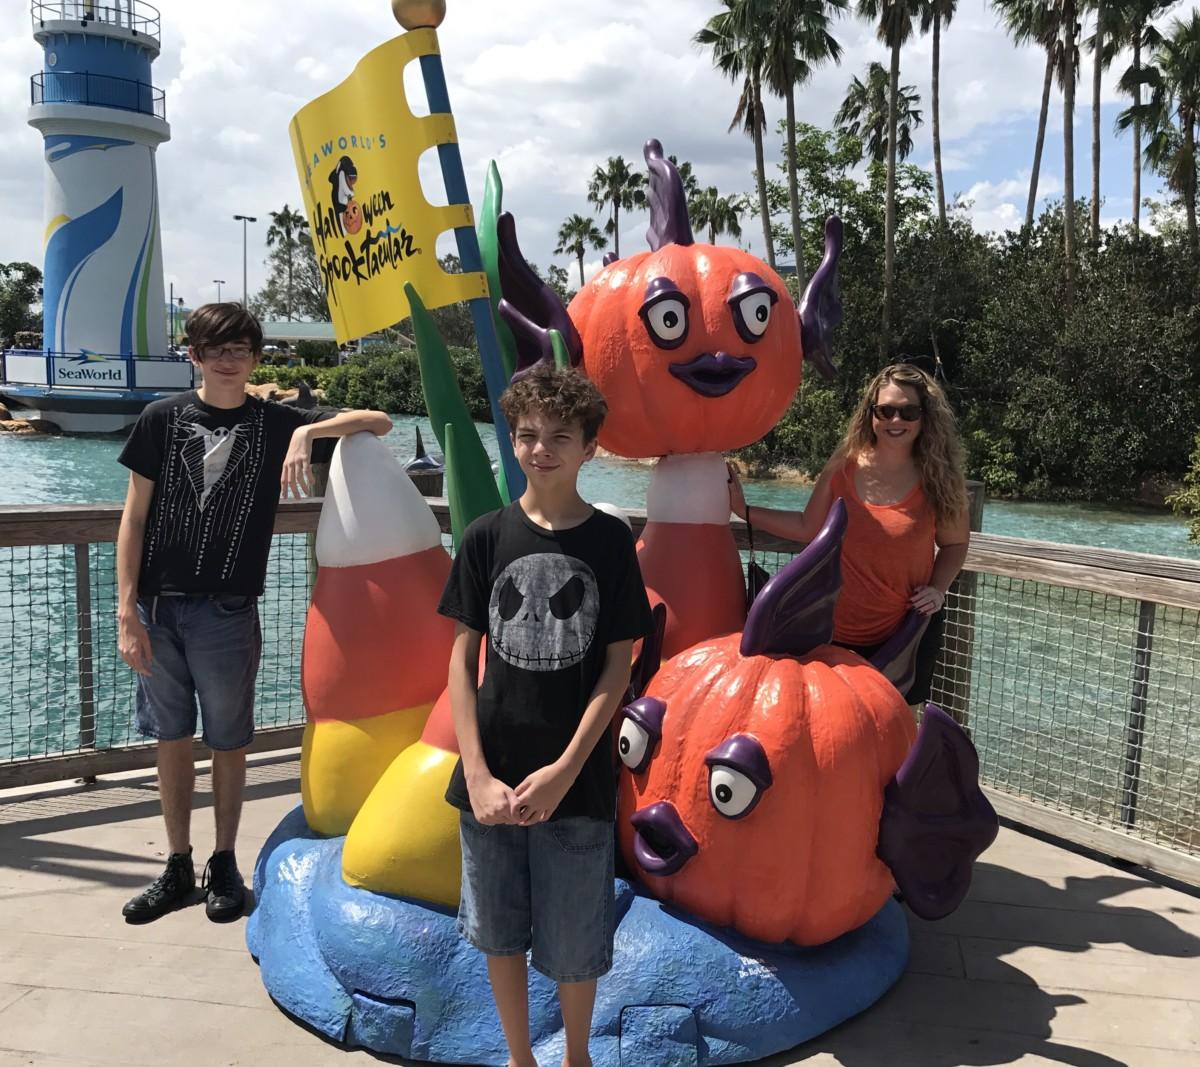 Photos from Sea World Orlando's Halloween Spooktacular 2